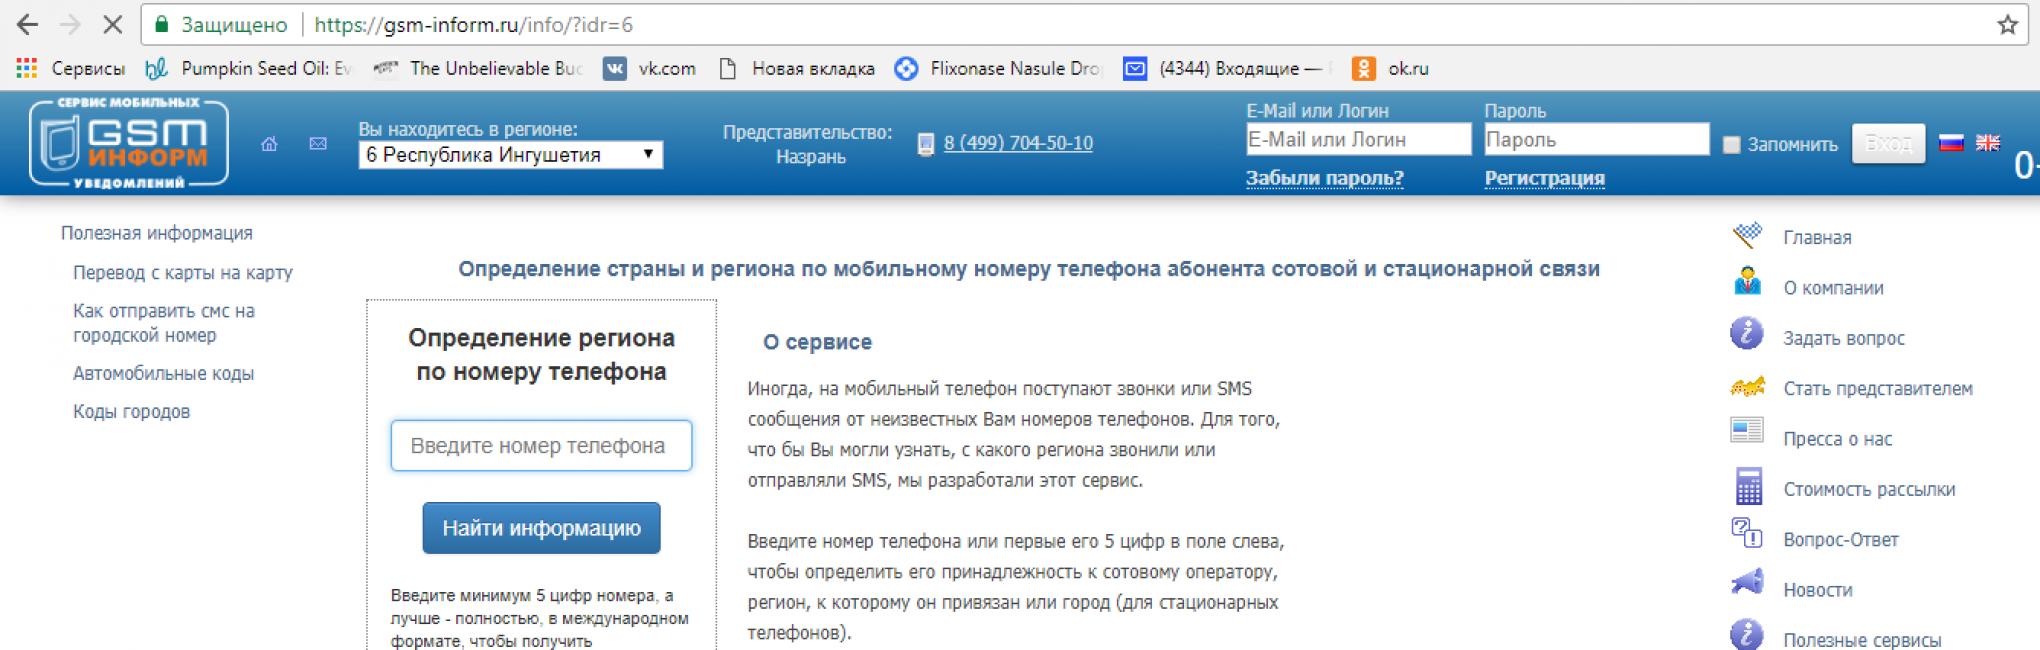 gsm-inform.ru